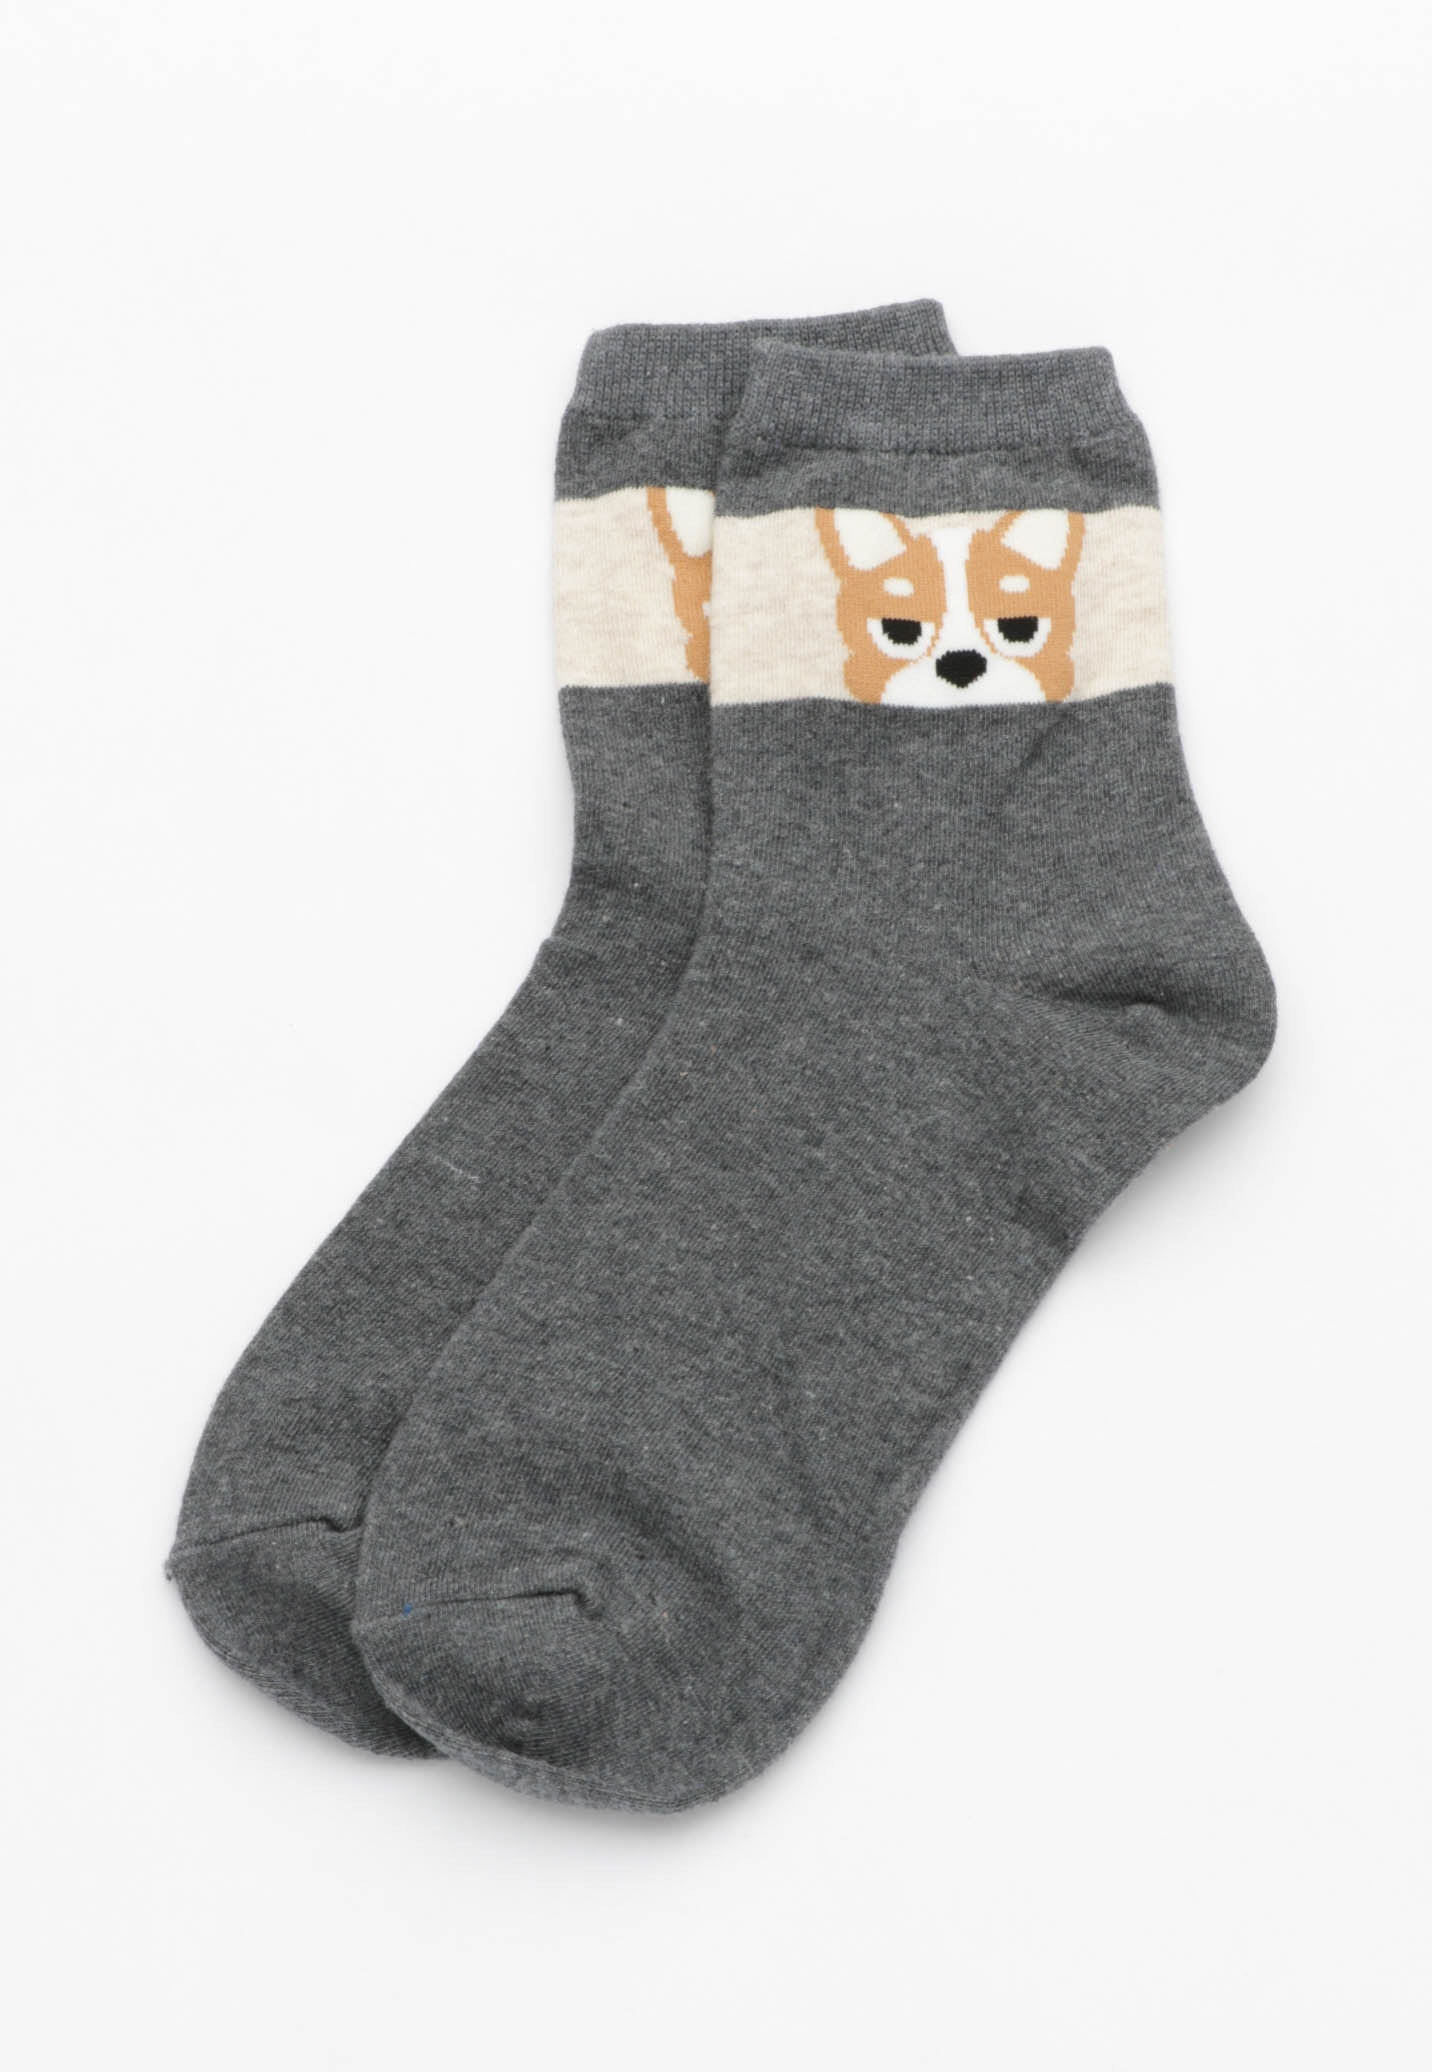 Shifty Eye Dog Socks - Charcoal